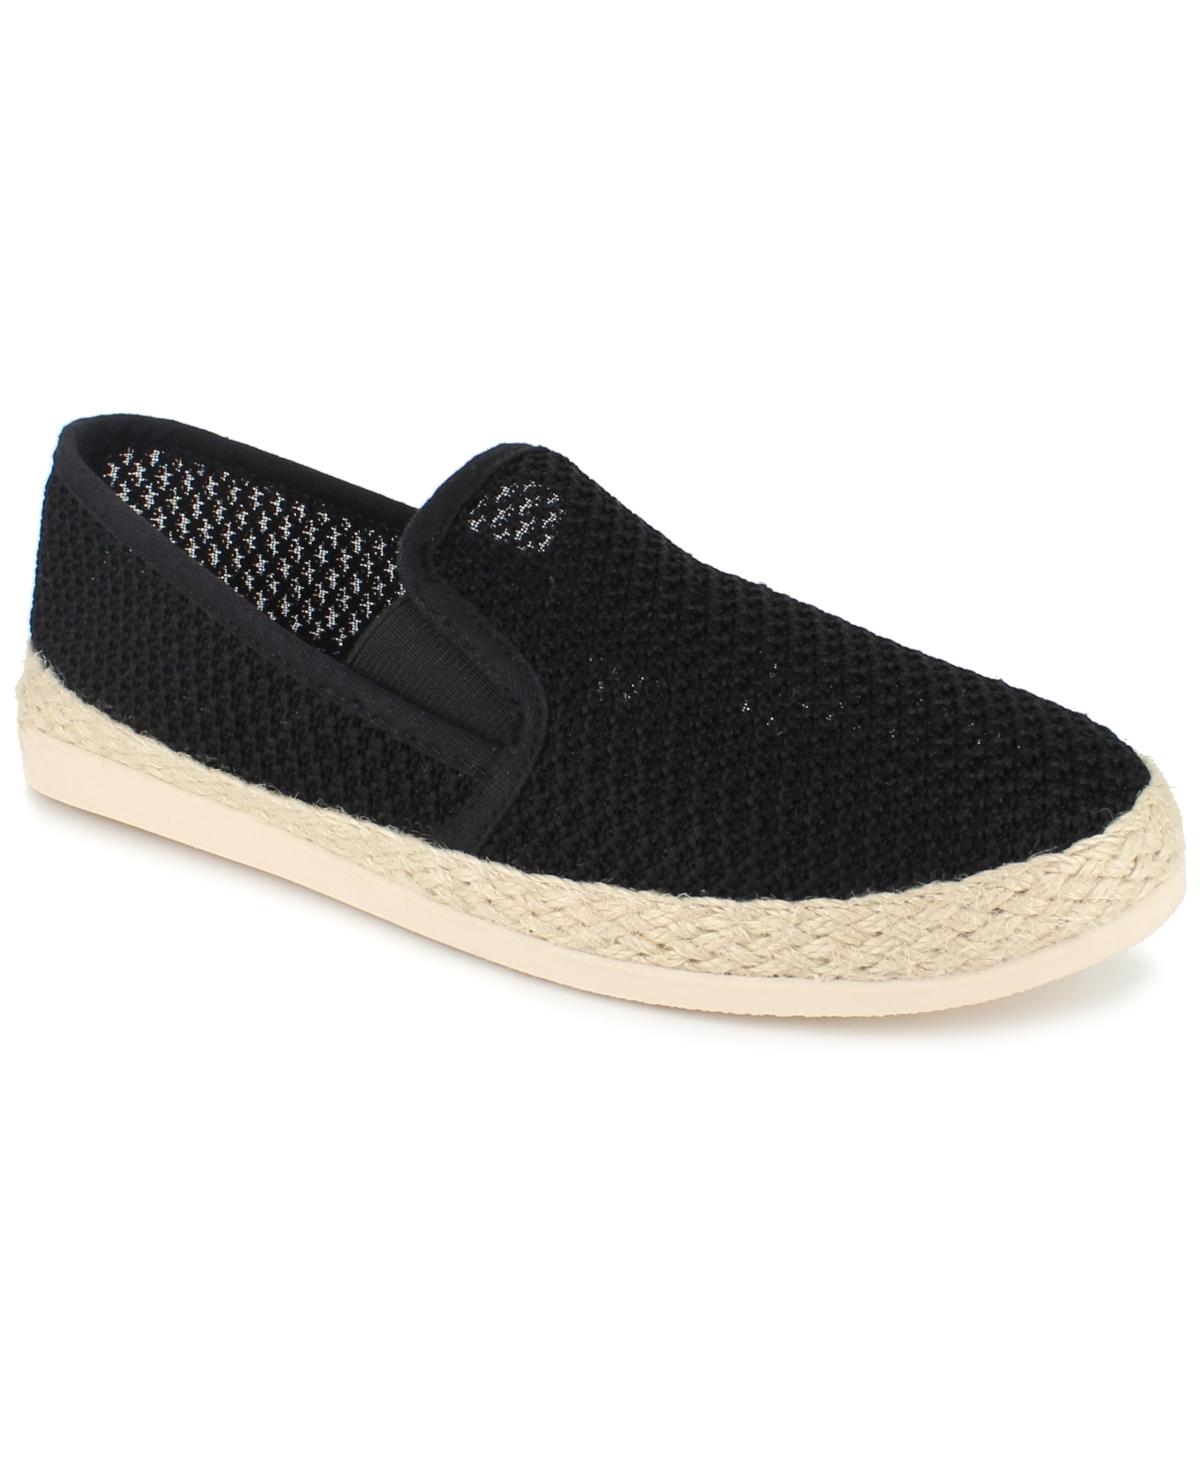 Esprit Eliana Slip-On Espadrille Flats, Created for Macy's Women's Shoes